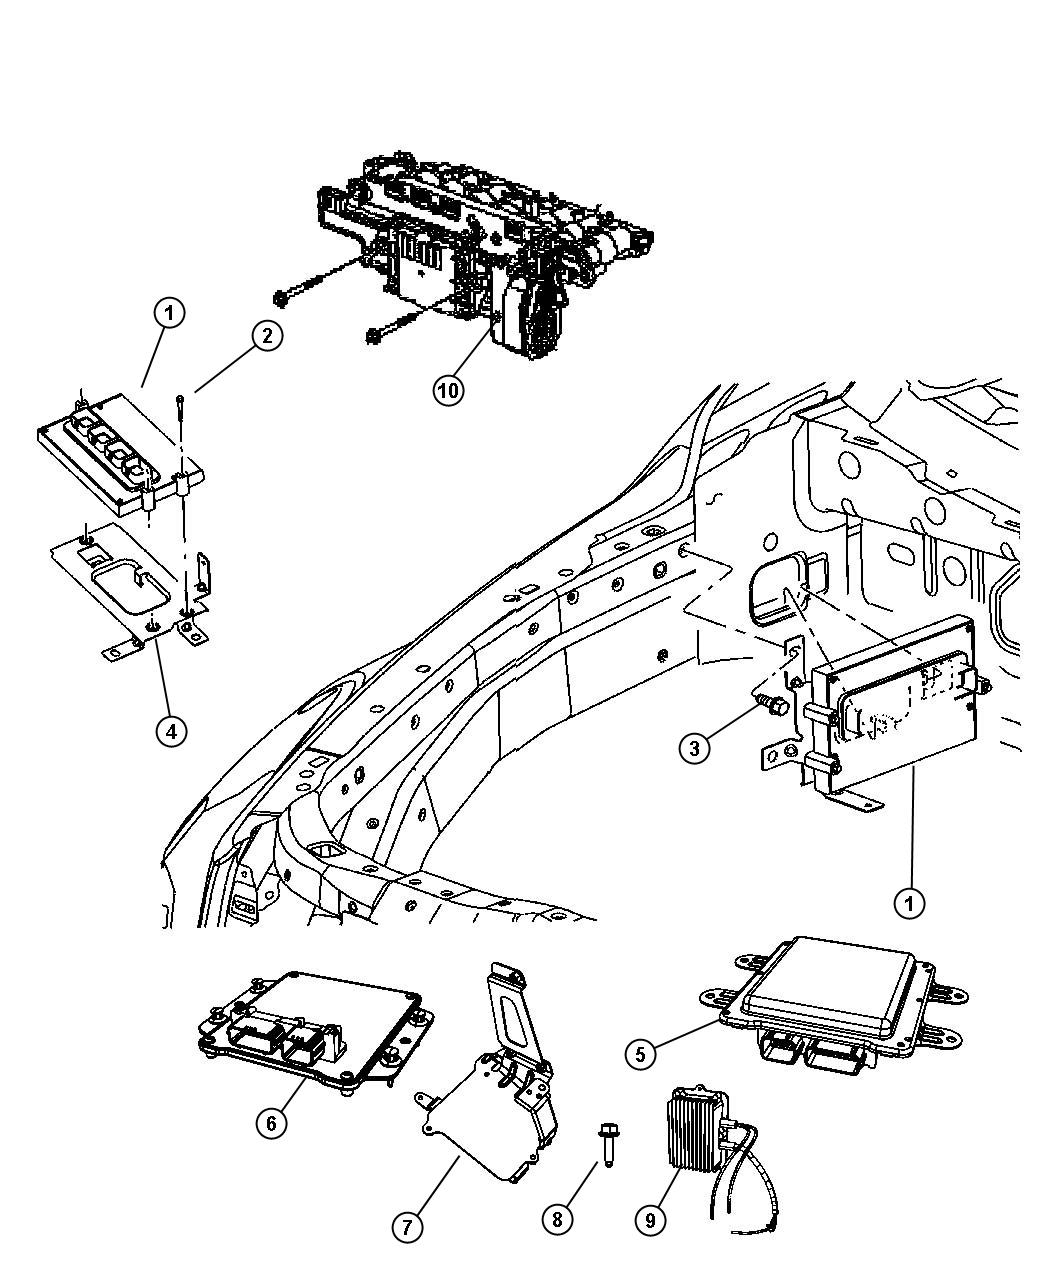 2009 Jeep Grand Cherokee Module. Powertrain control